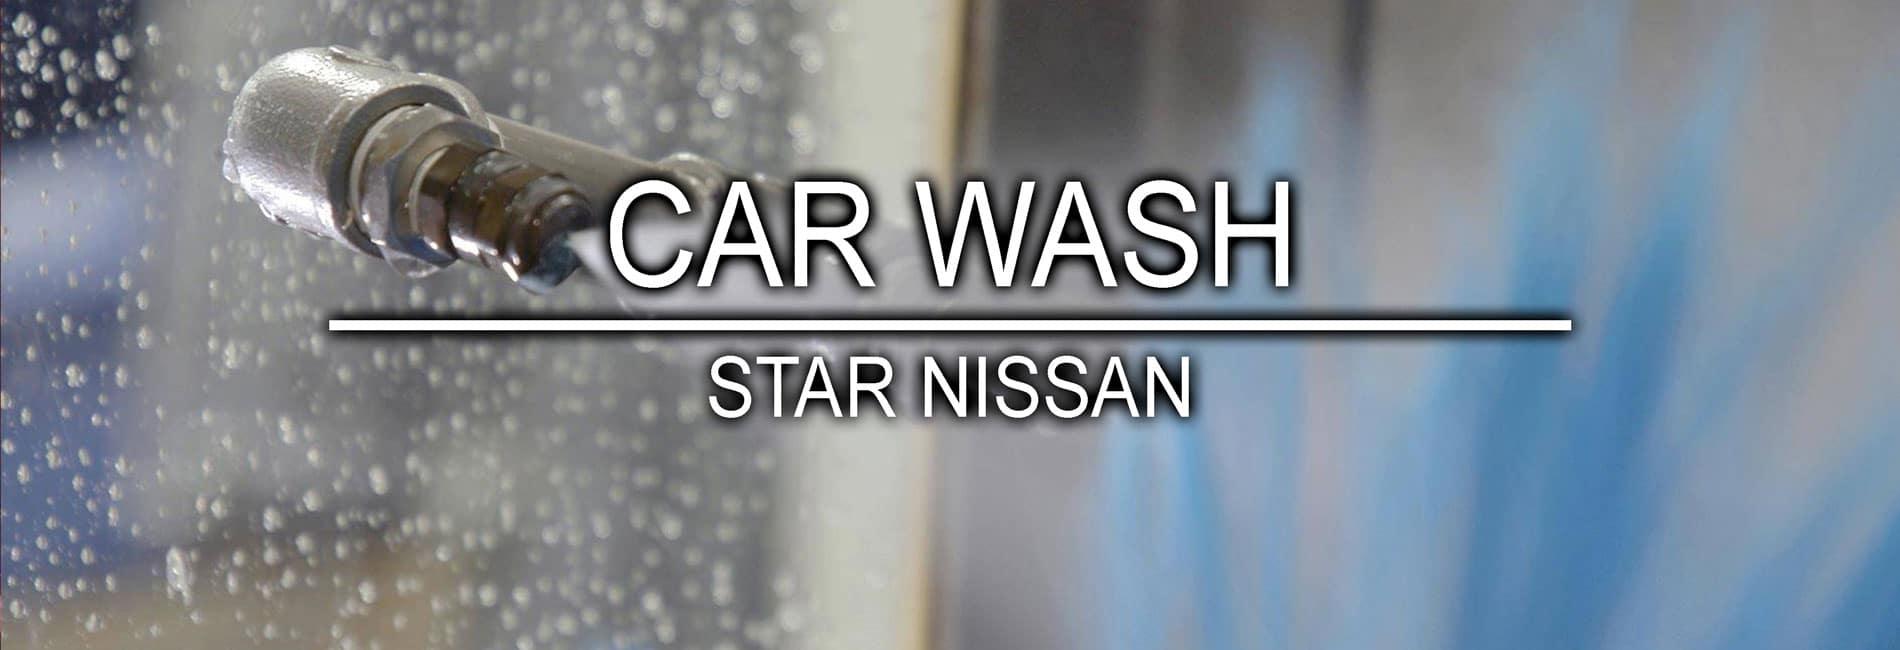 Car Wash Service at Star Nissan